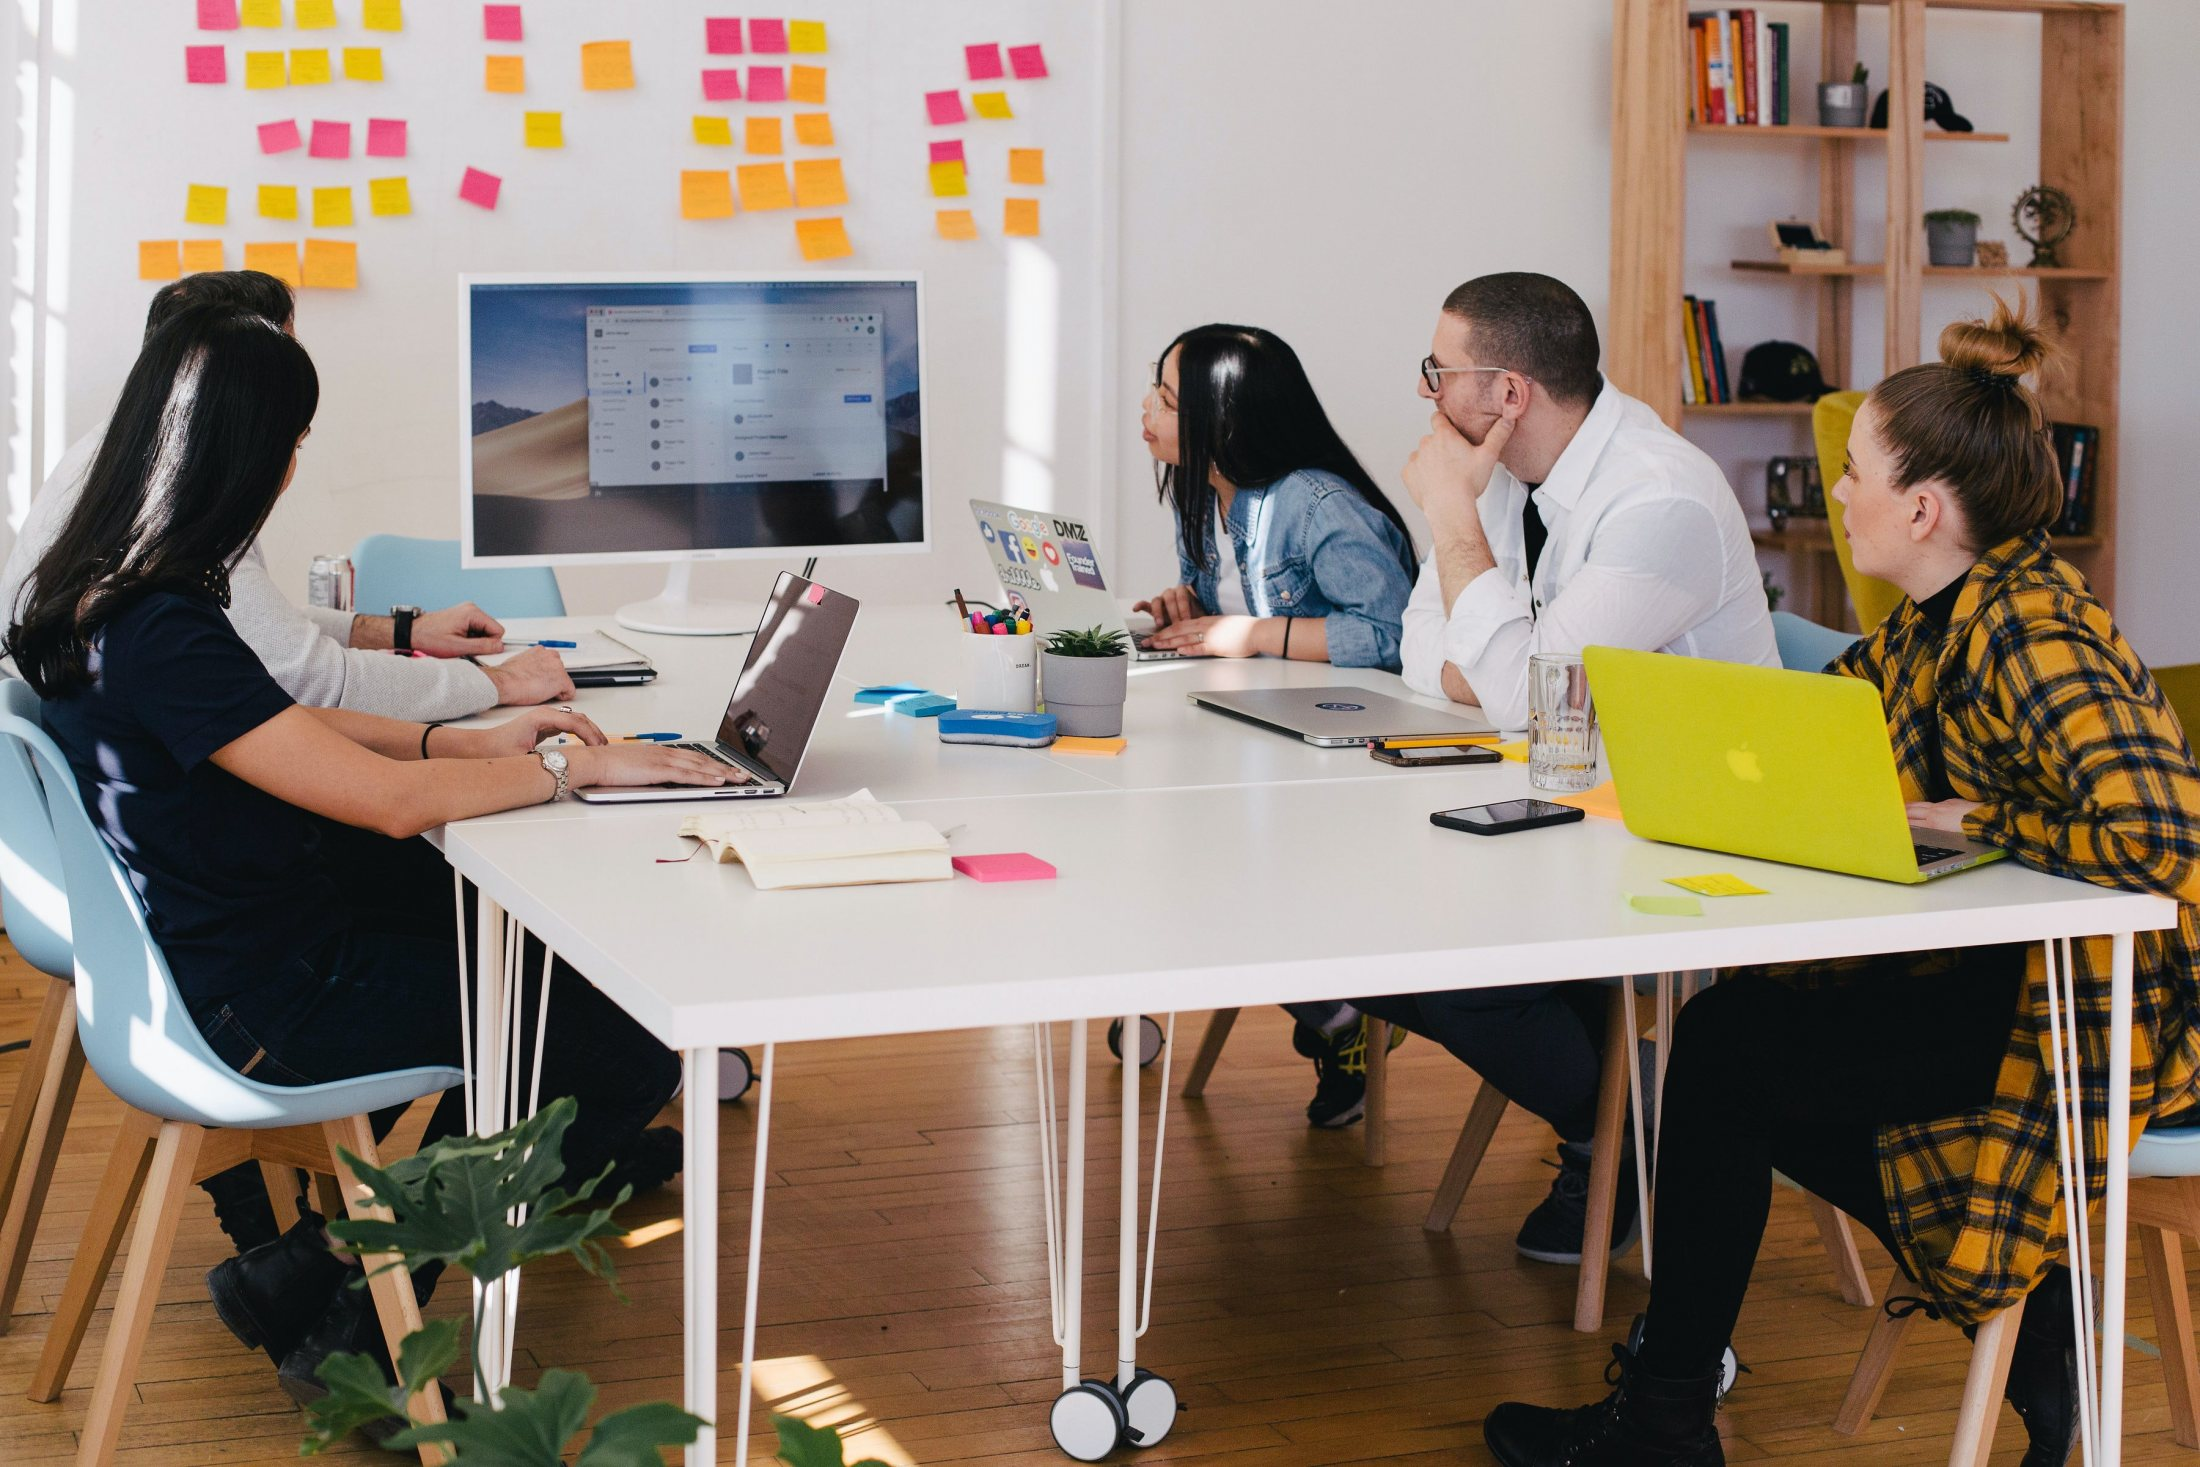 Wie Meetings großartig werden